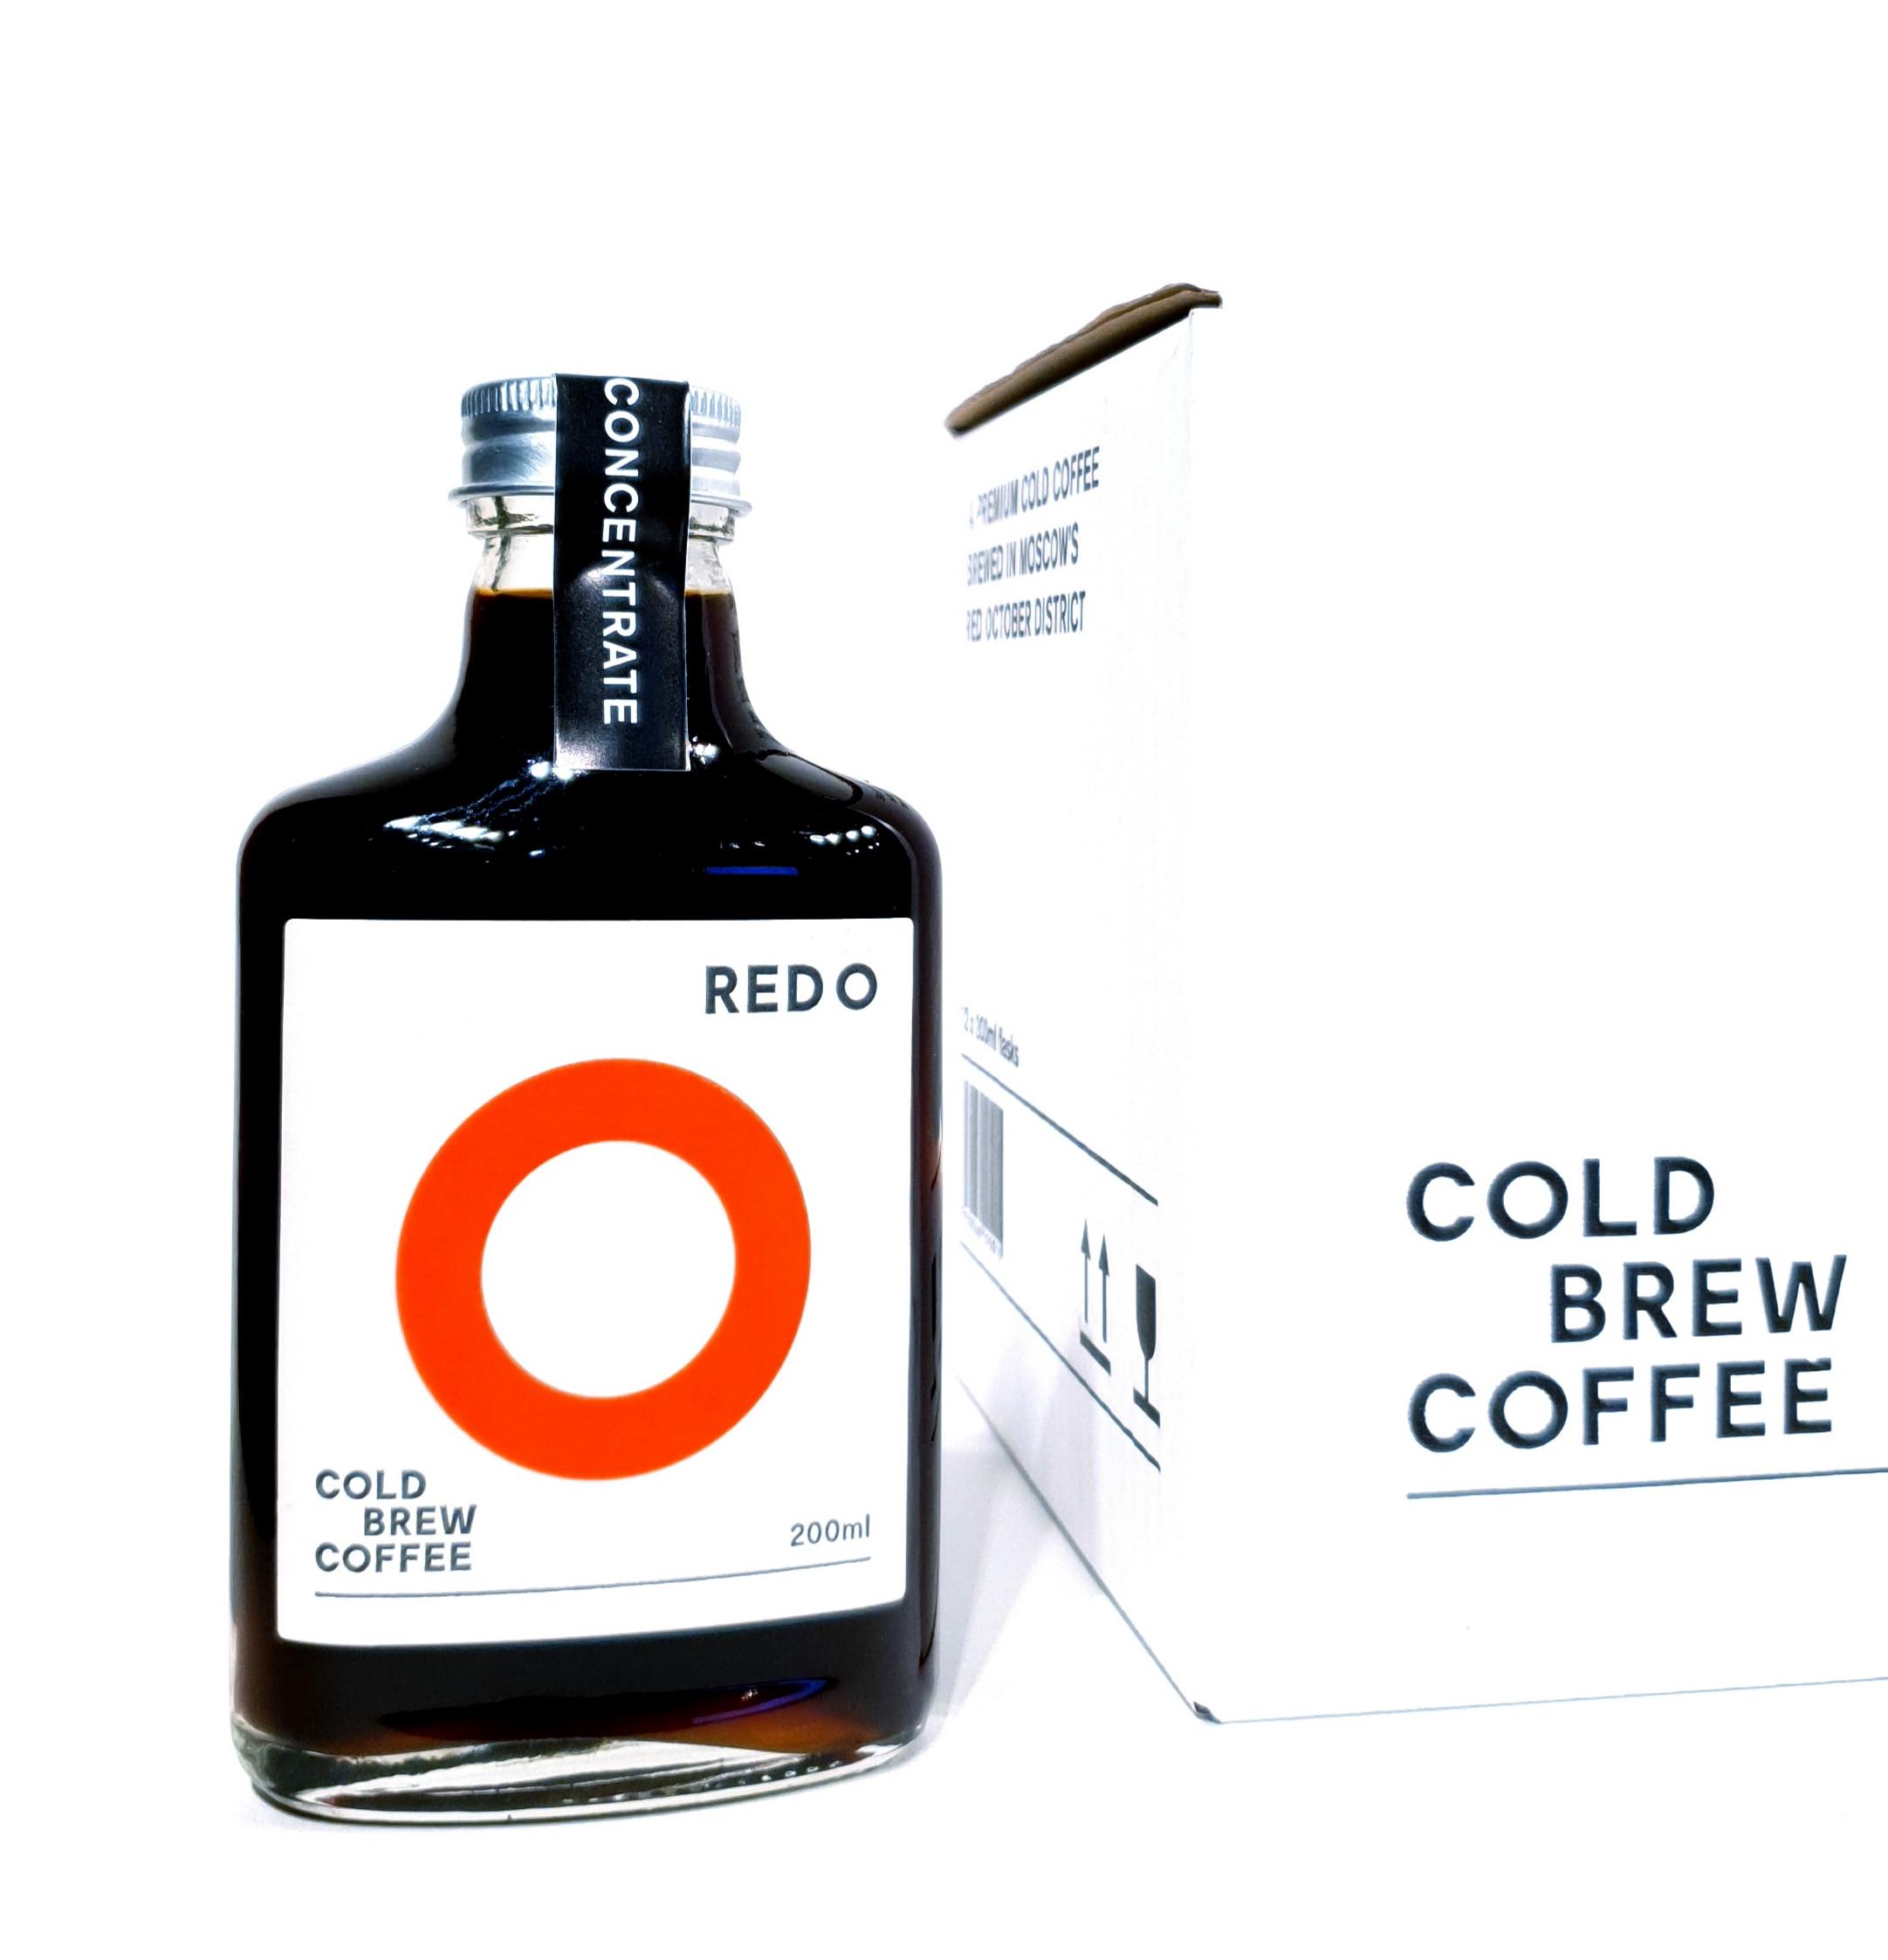 REDO Концентрат Колд брю кофе, 200 мл*12